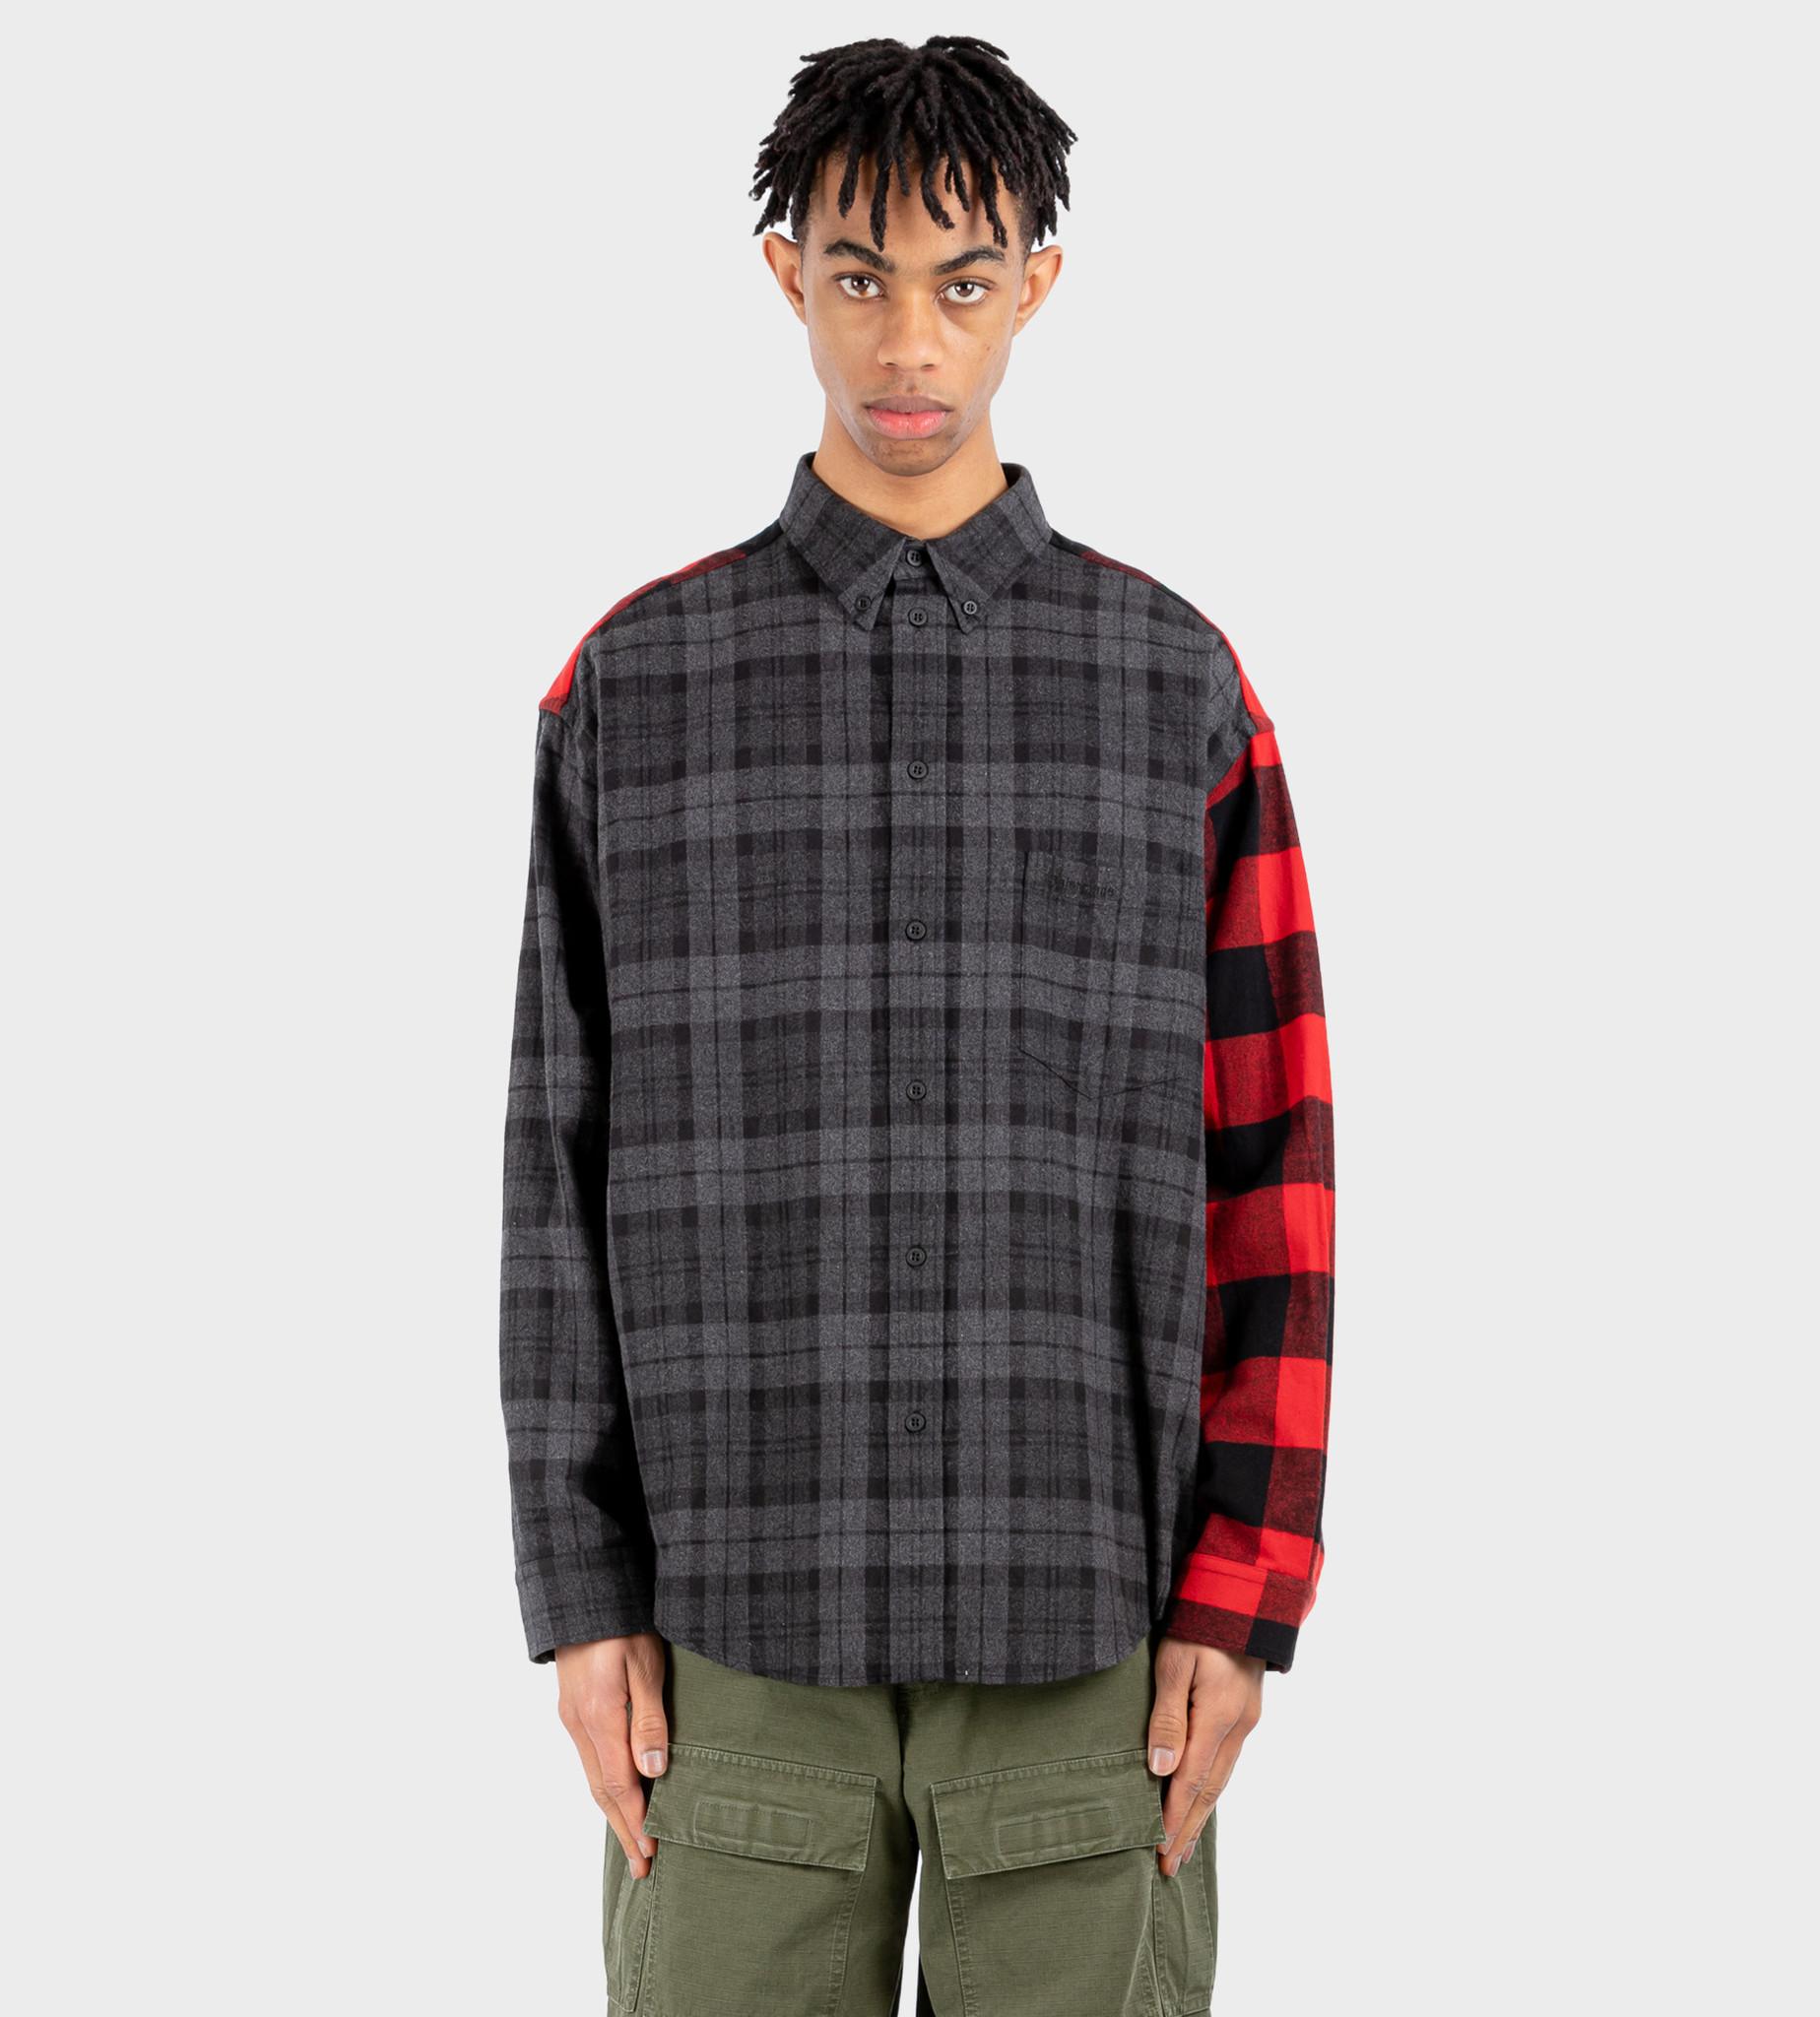 BALENCIAGA Patchwork Shirt Black Red